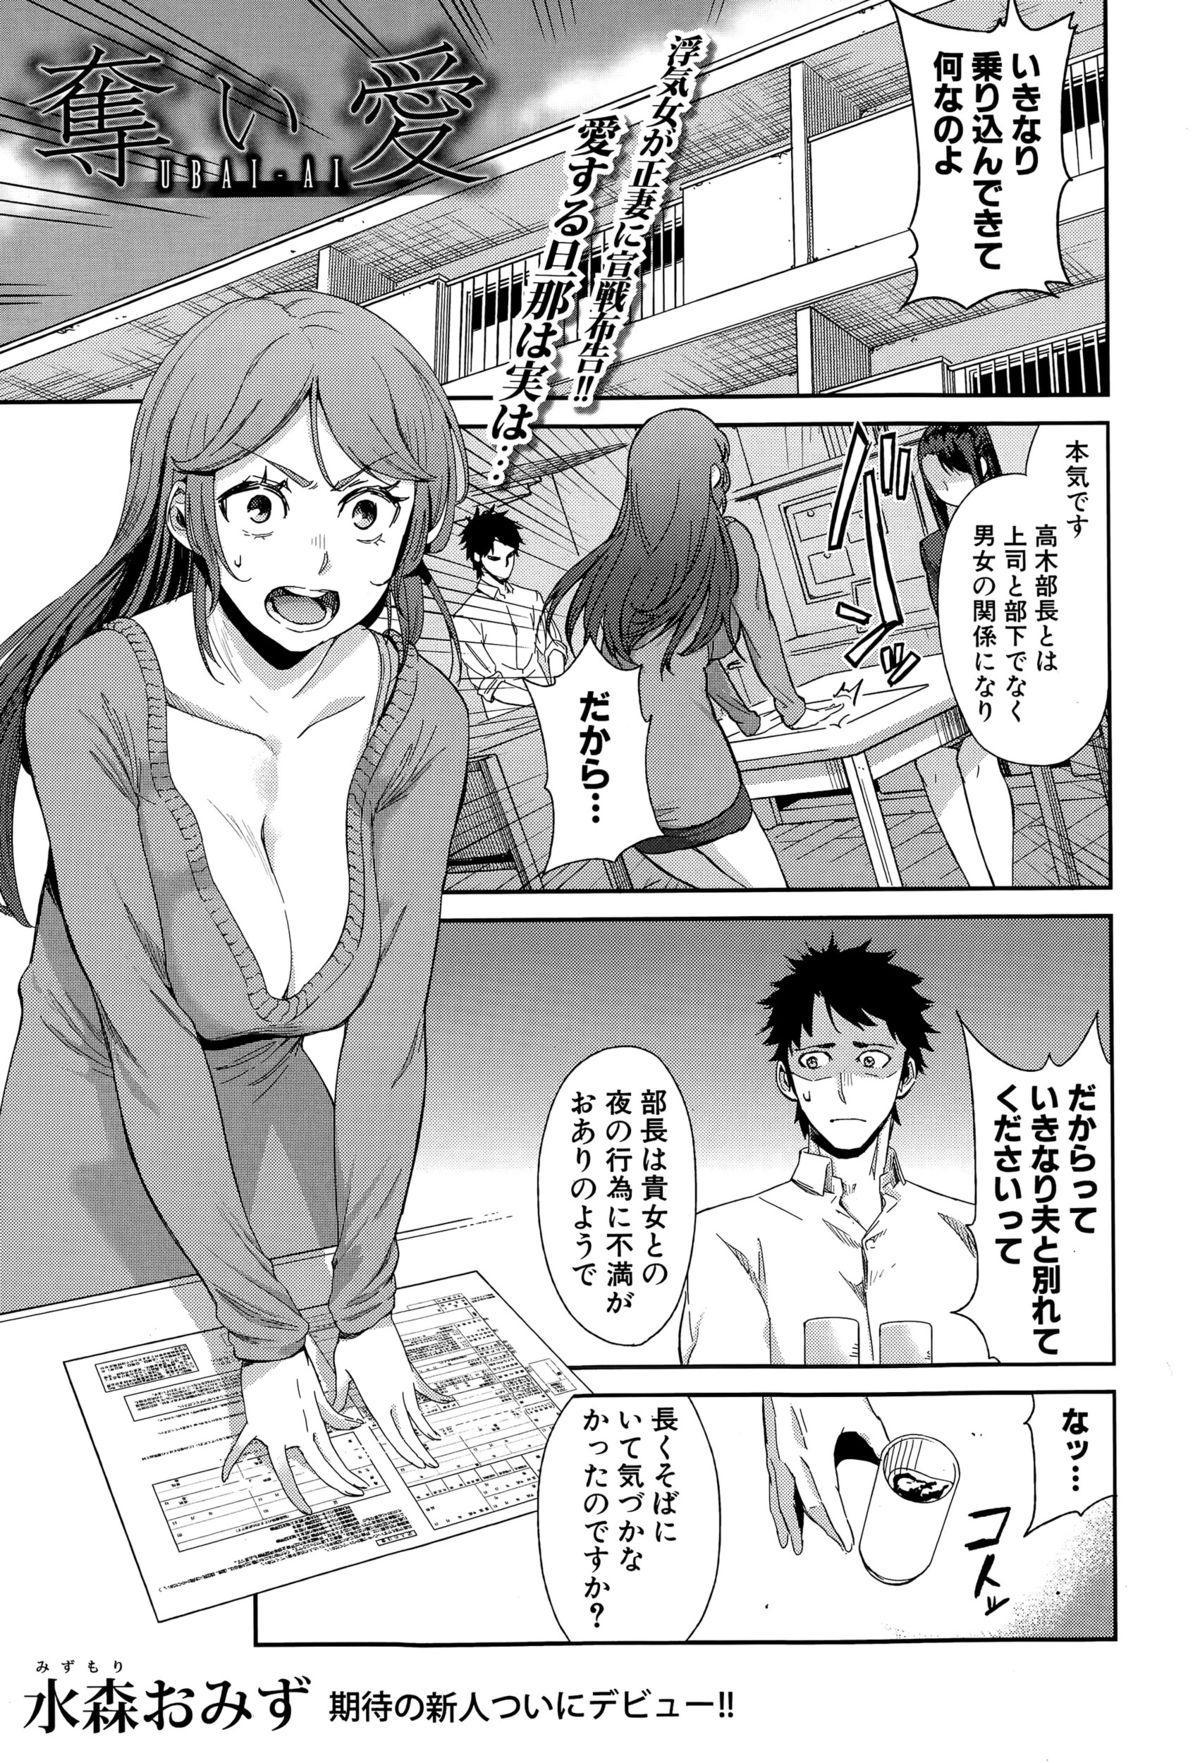 COMIC Shingeki 2015-07 267